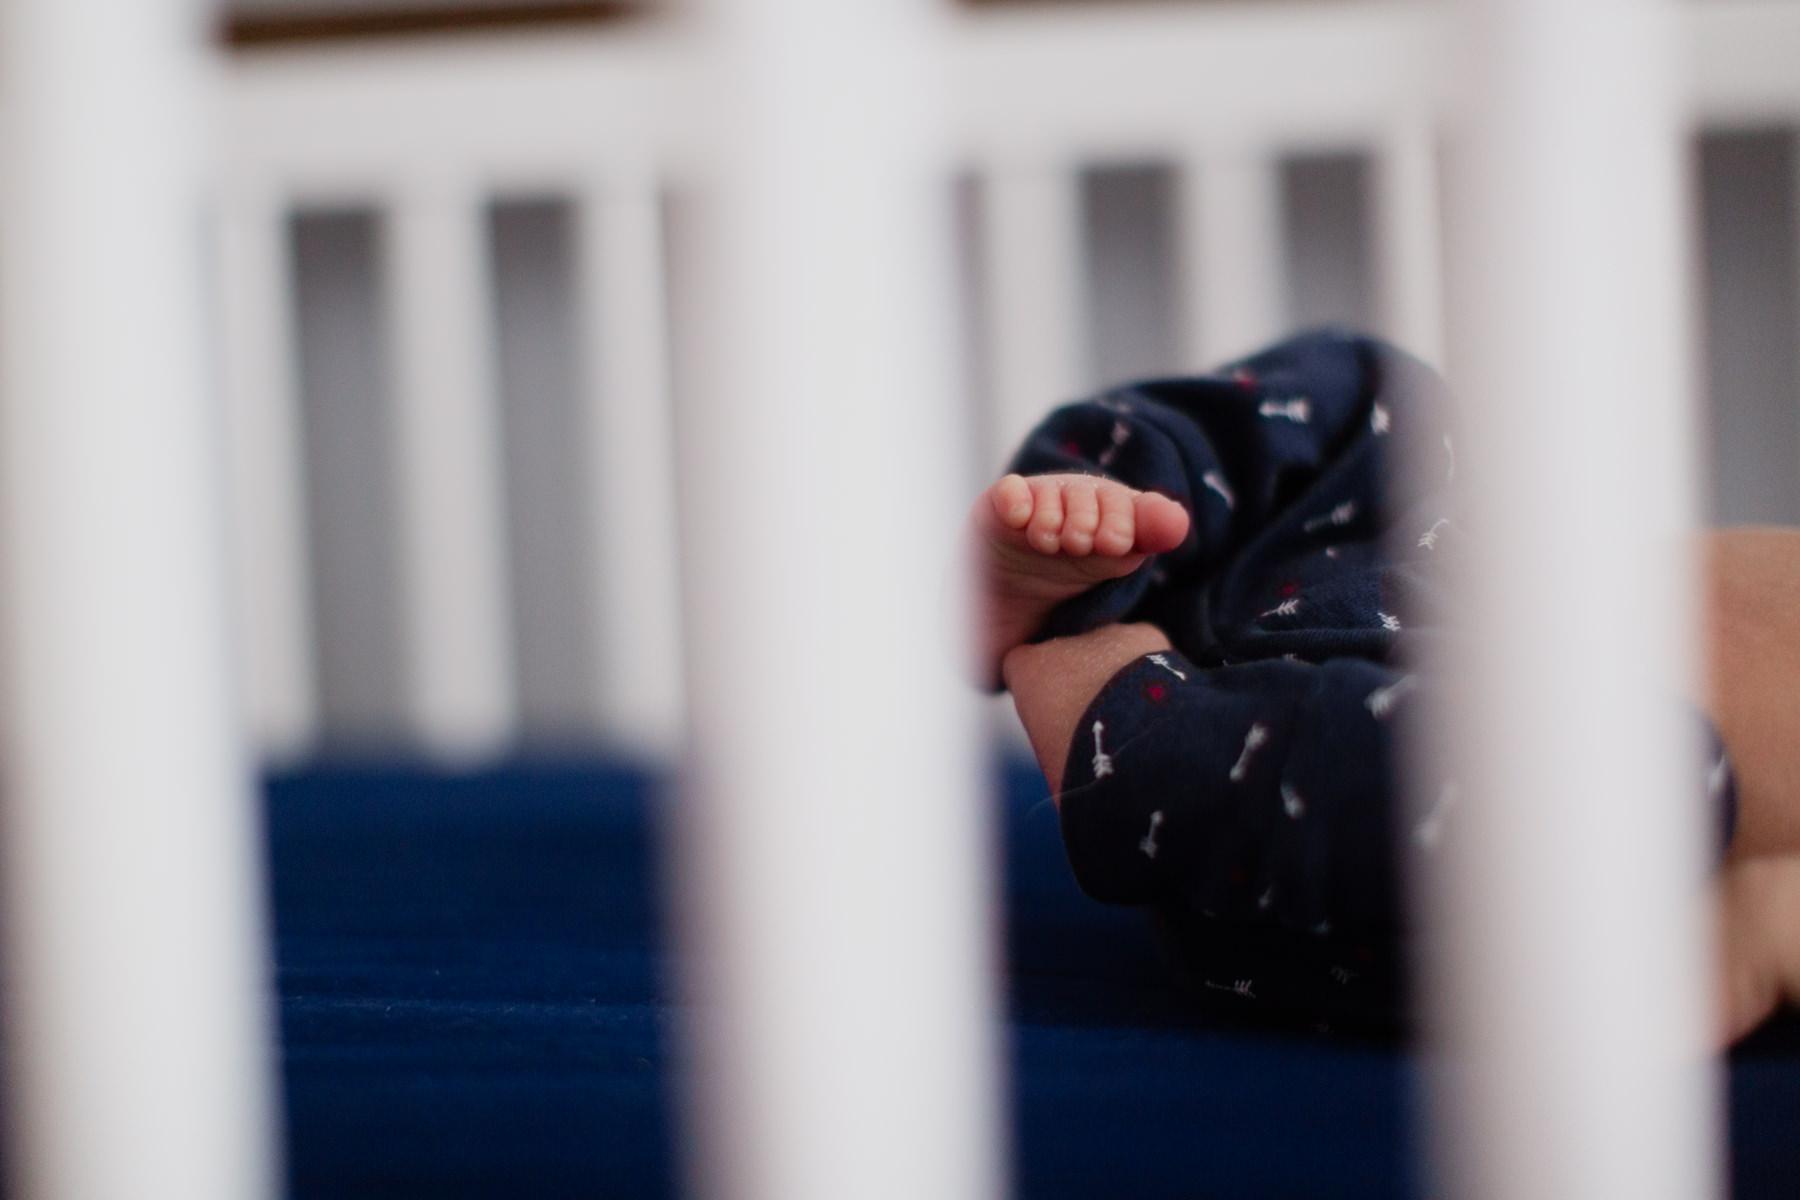 Newborn_Nursery_Photos_In_Home_Baby_Feet_Edmond.JPG